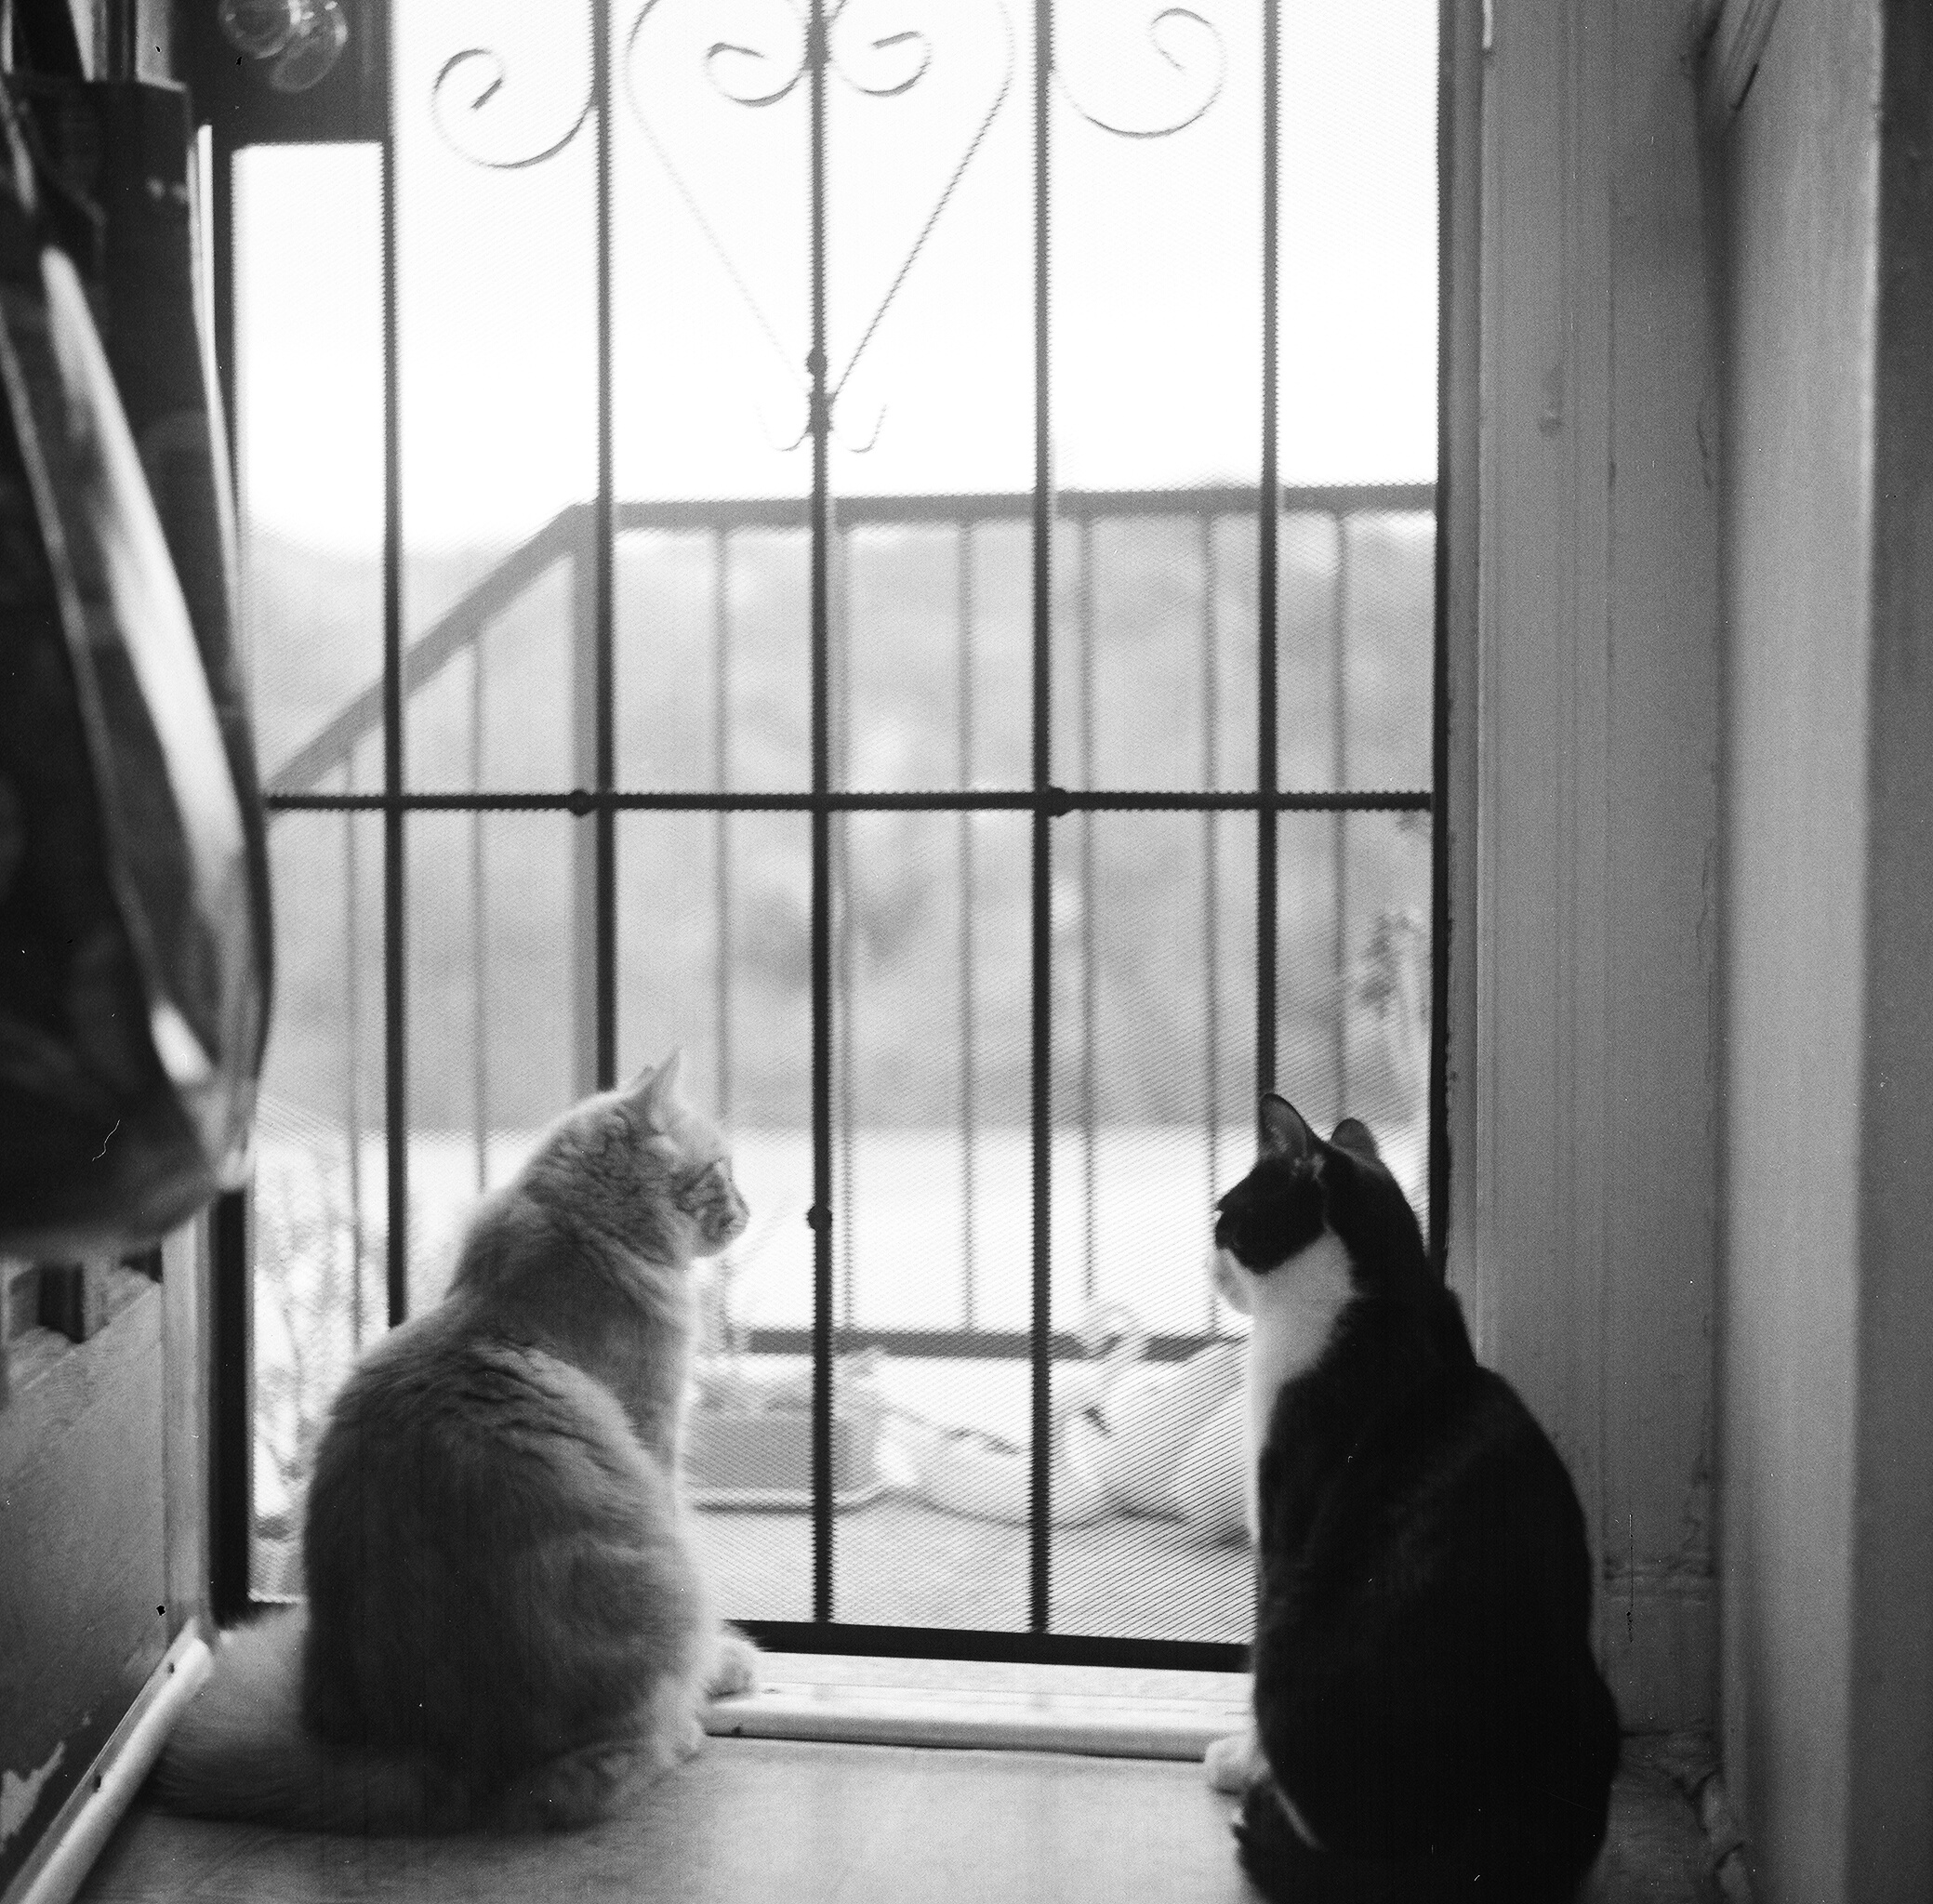 catboys.jpg